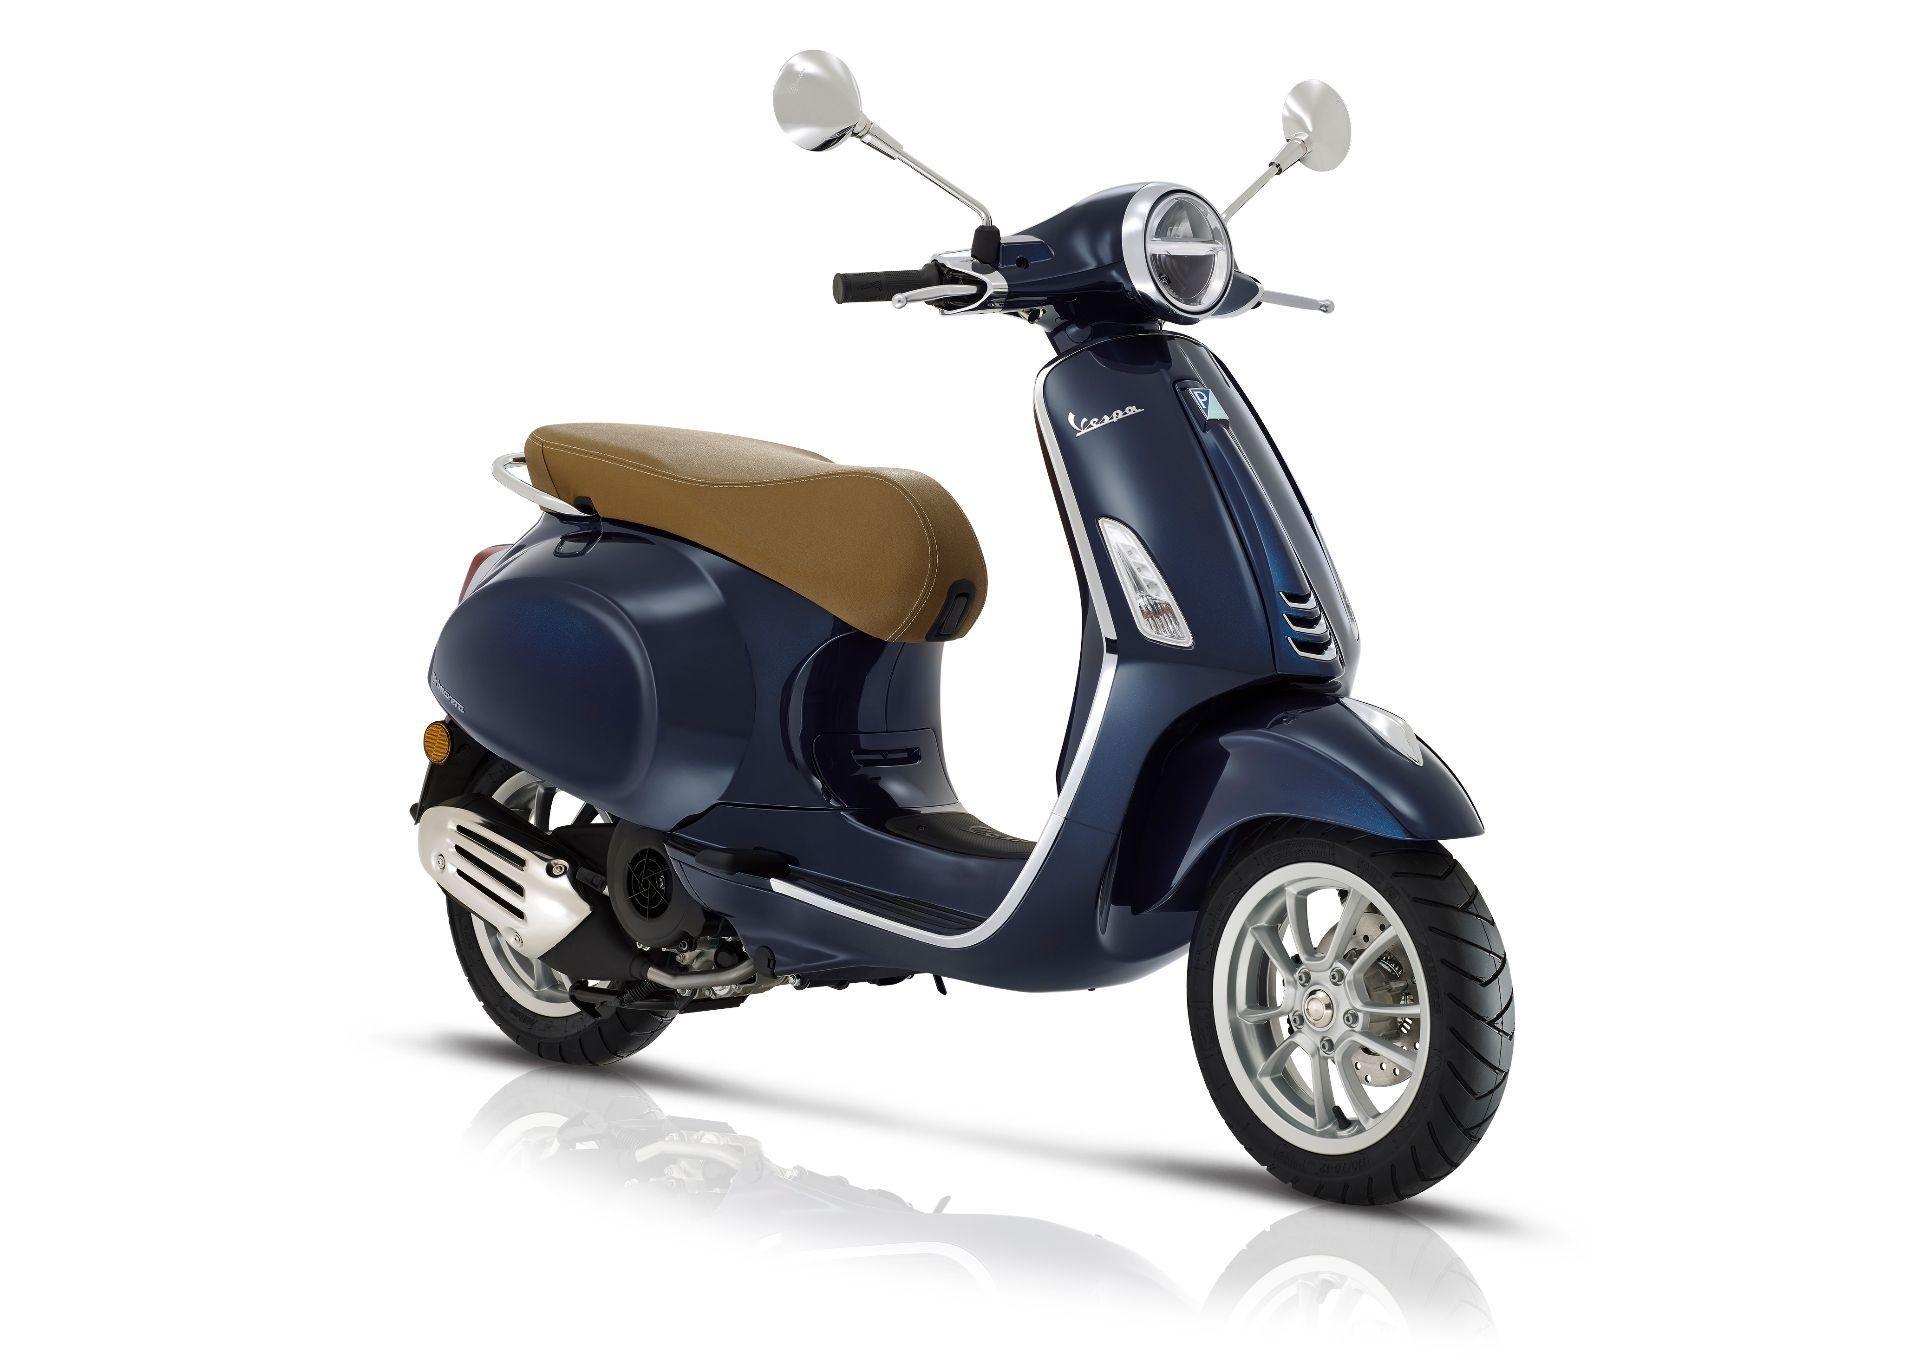 moto neuve acheter piaggio vespa primavera 125 abs iget 12 wullschleger motorradsport zofingen. Black Bedroom Furniture Sets. Home Design Ideas